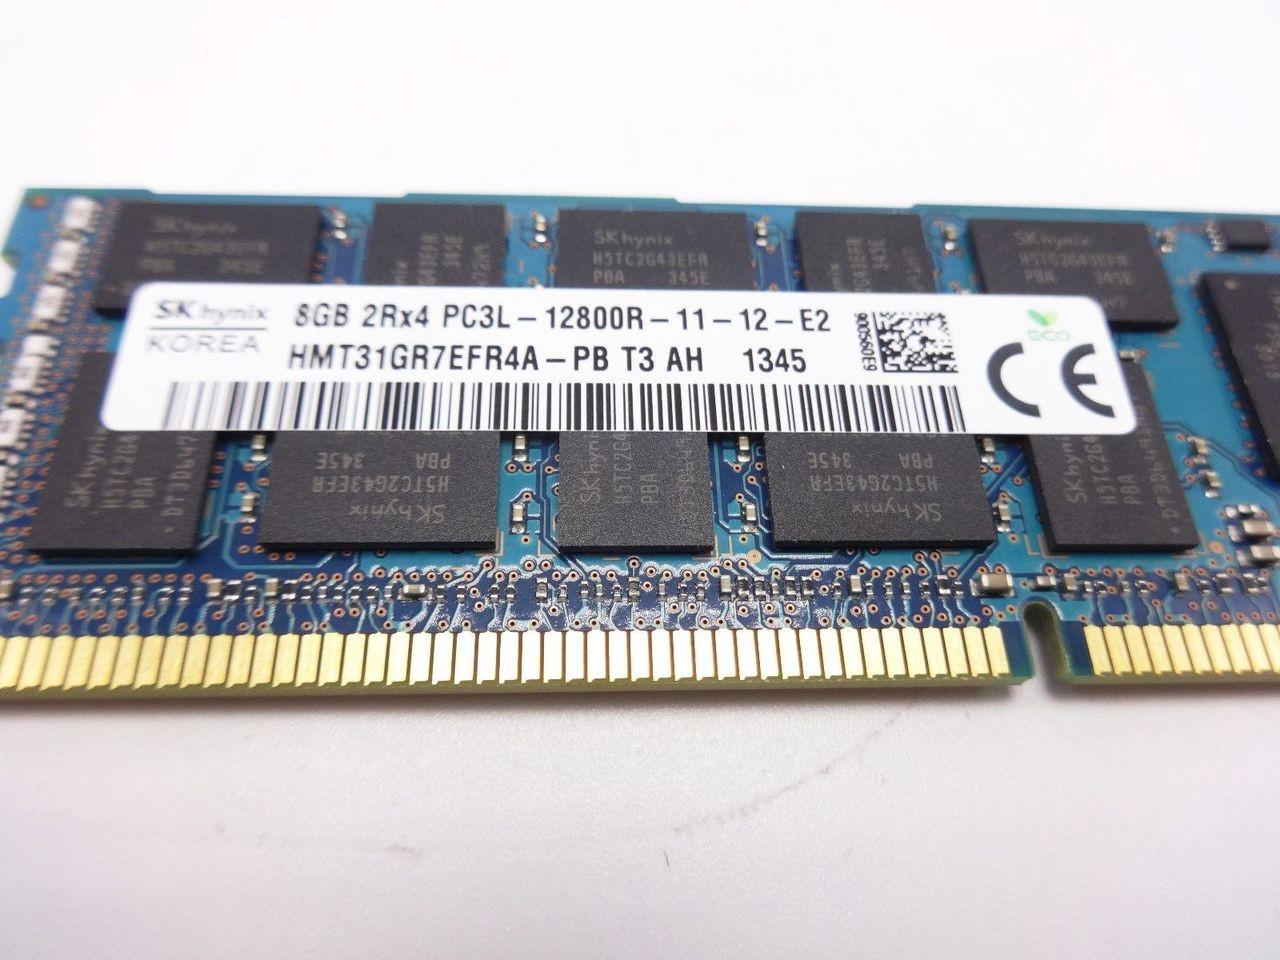 HYNIX HMT31GR7EFR4A-PB 8GB PC3L 12800R 2RX4 memory dimm